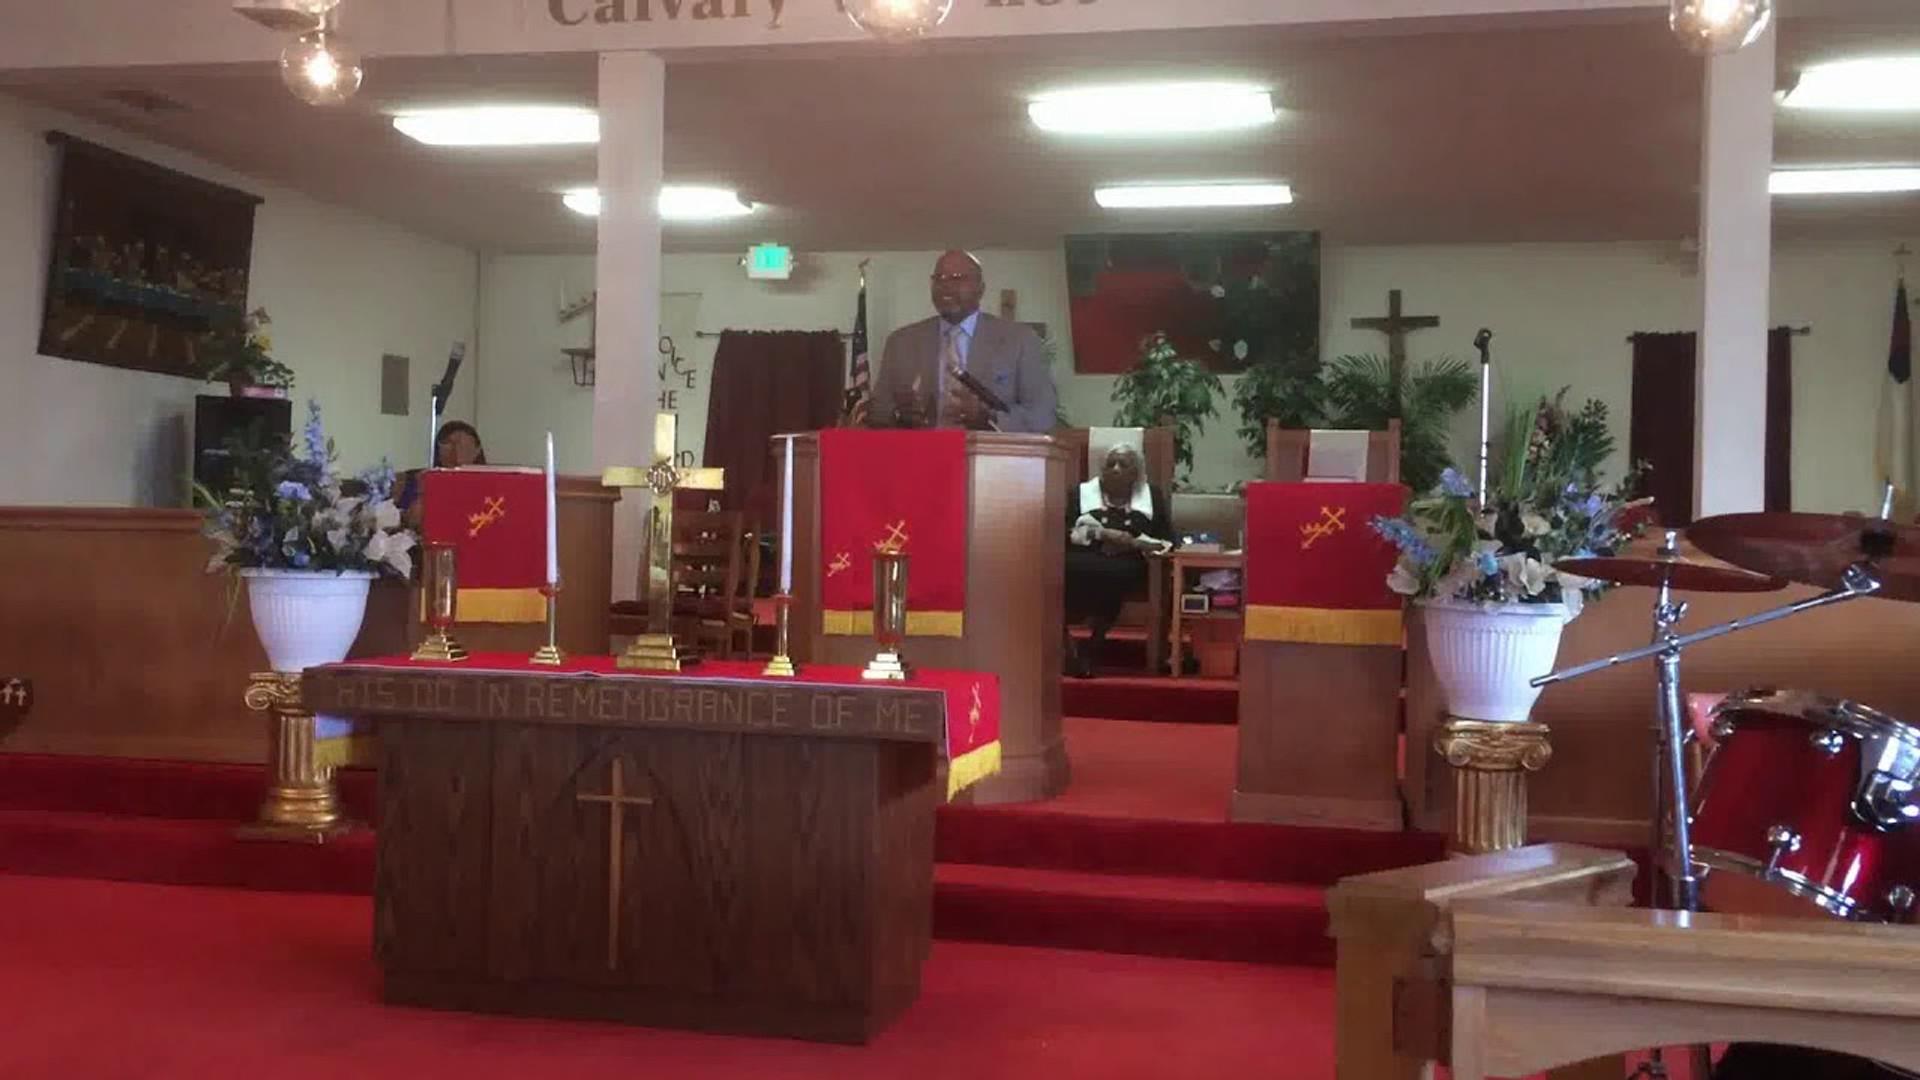 Elder Rudolph Grant